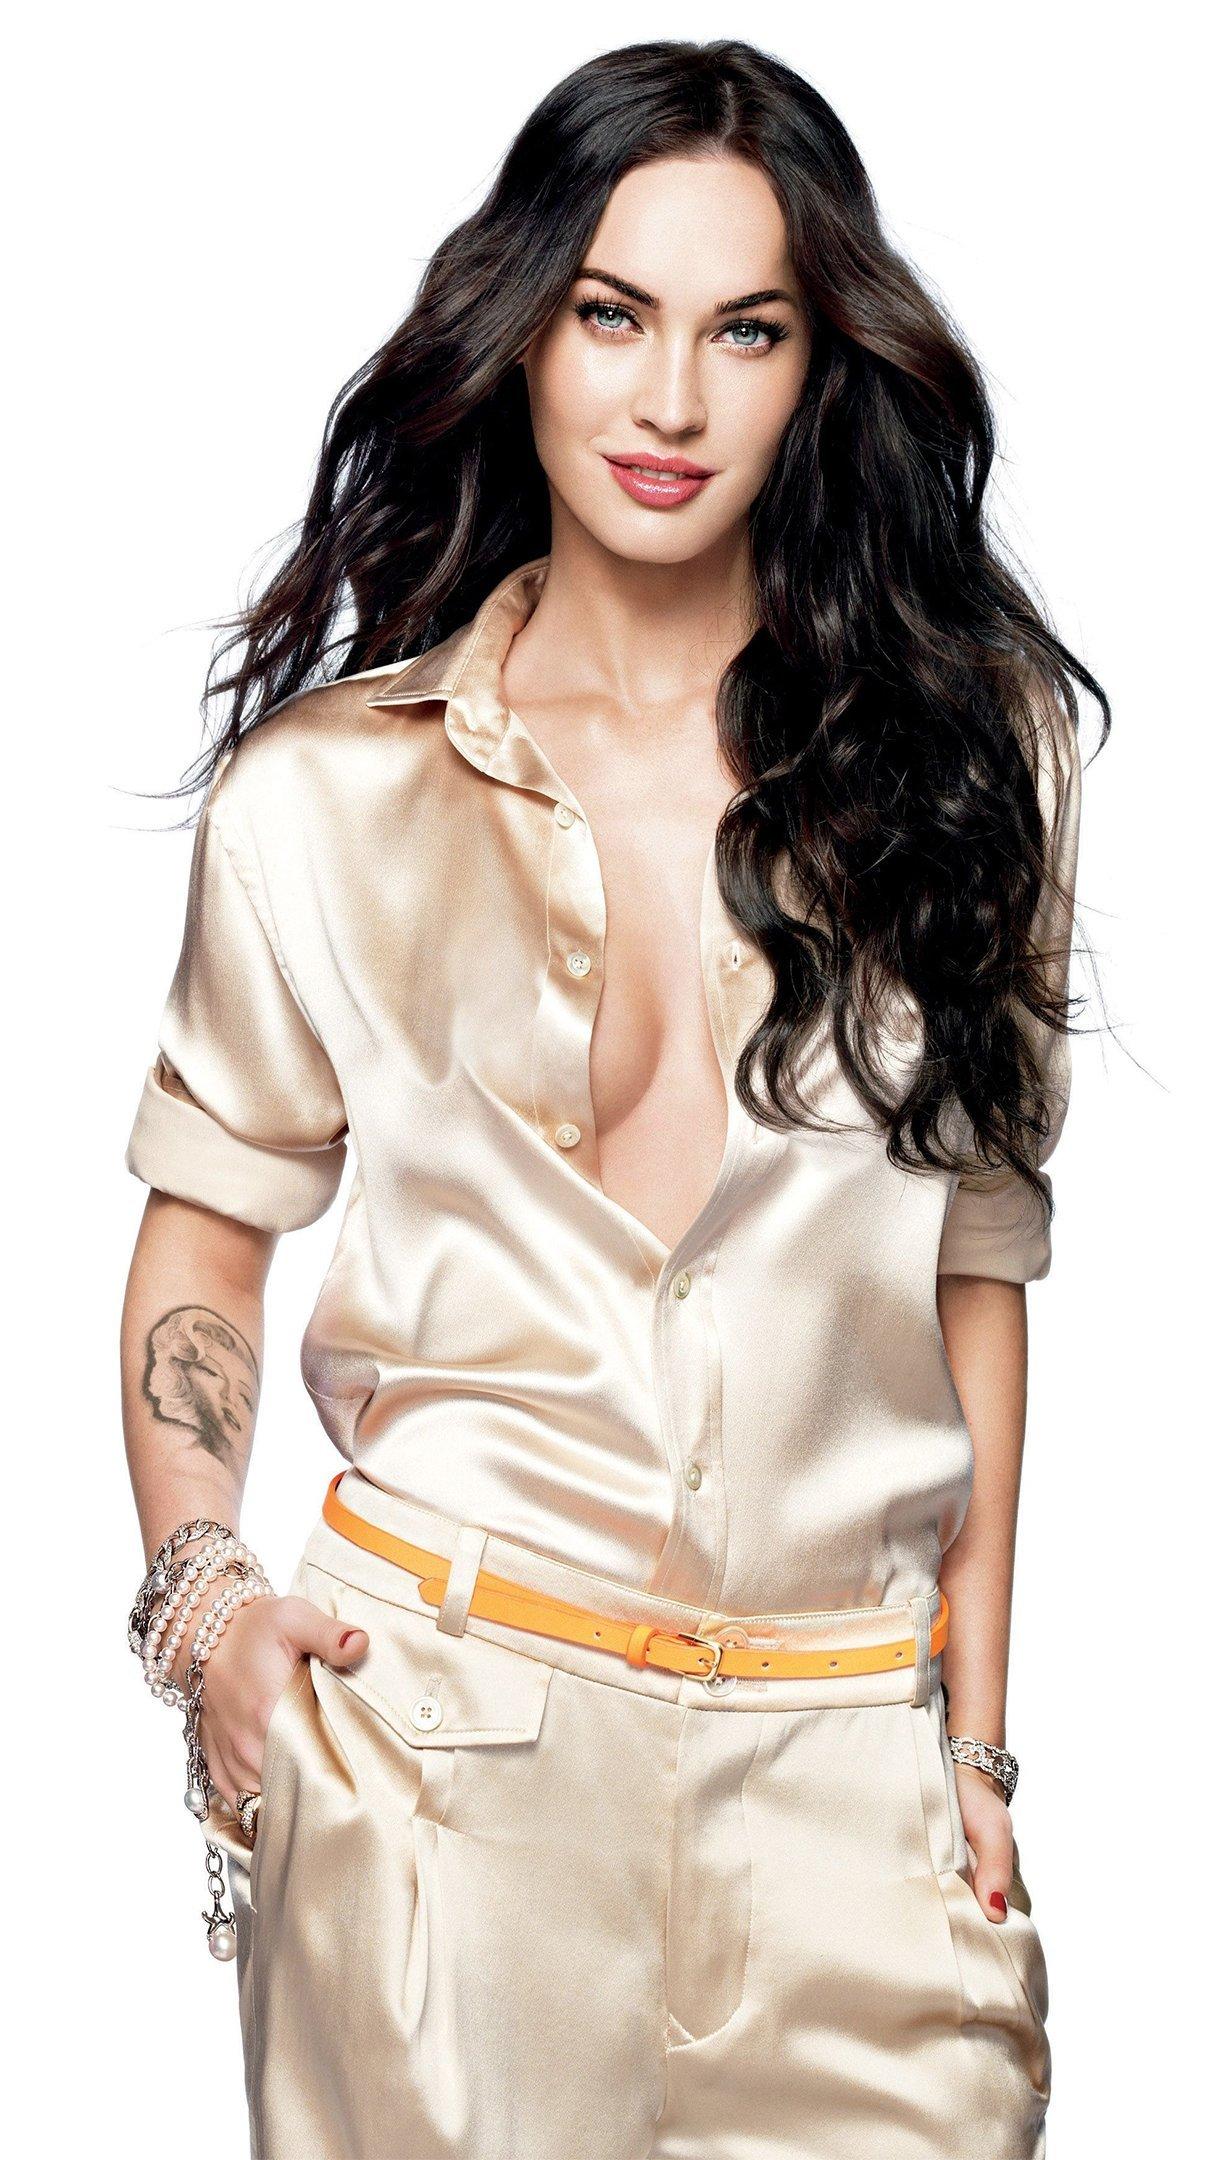 Fondos de pantalla Megan Fox photoshoot Vertical